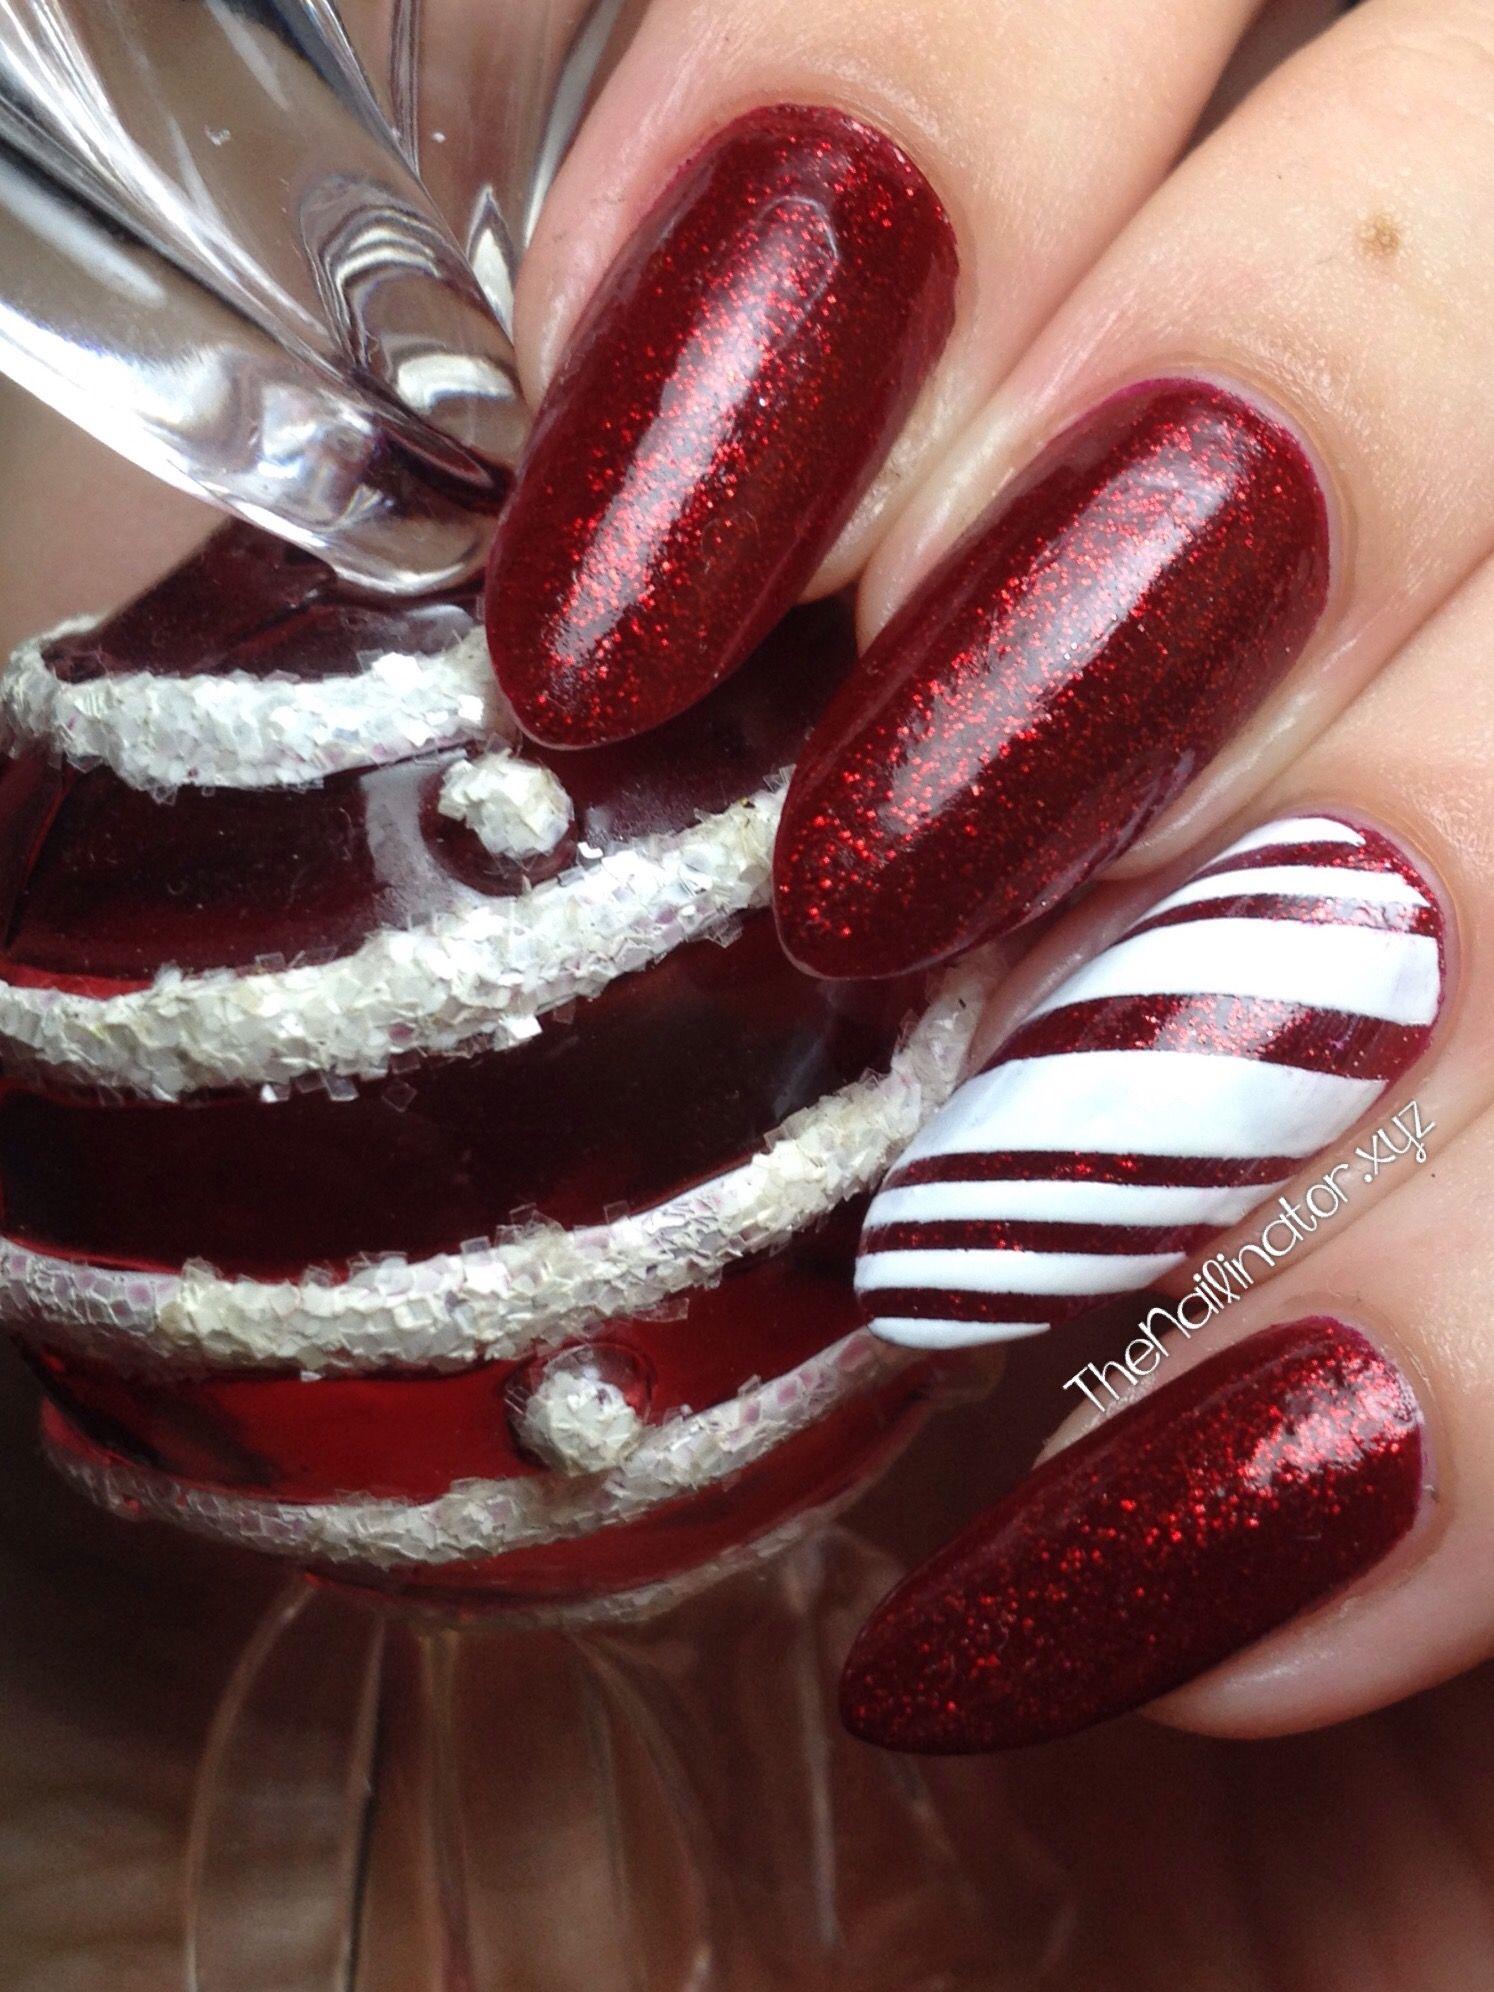 The Nailinator - Ruby Pumps Candy Cane Nail Art Tutorial | My nails ...